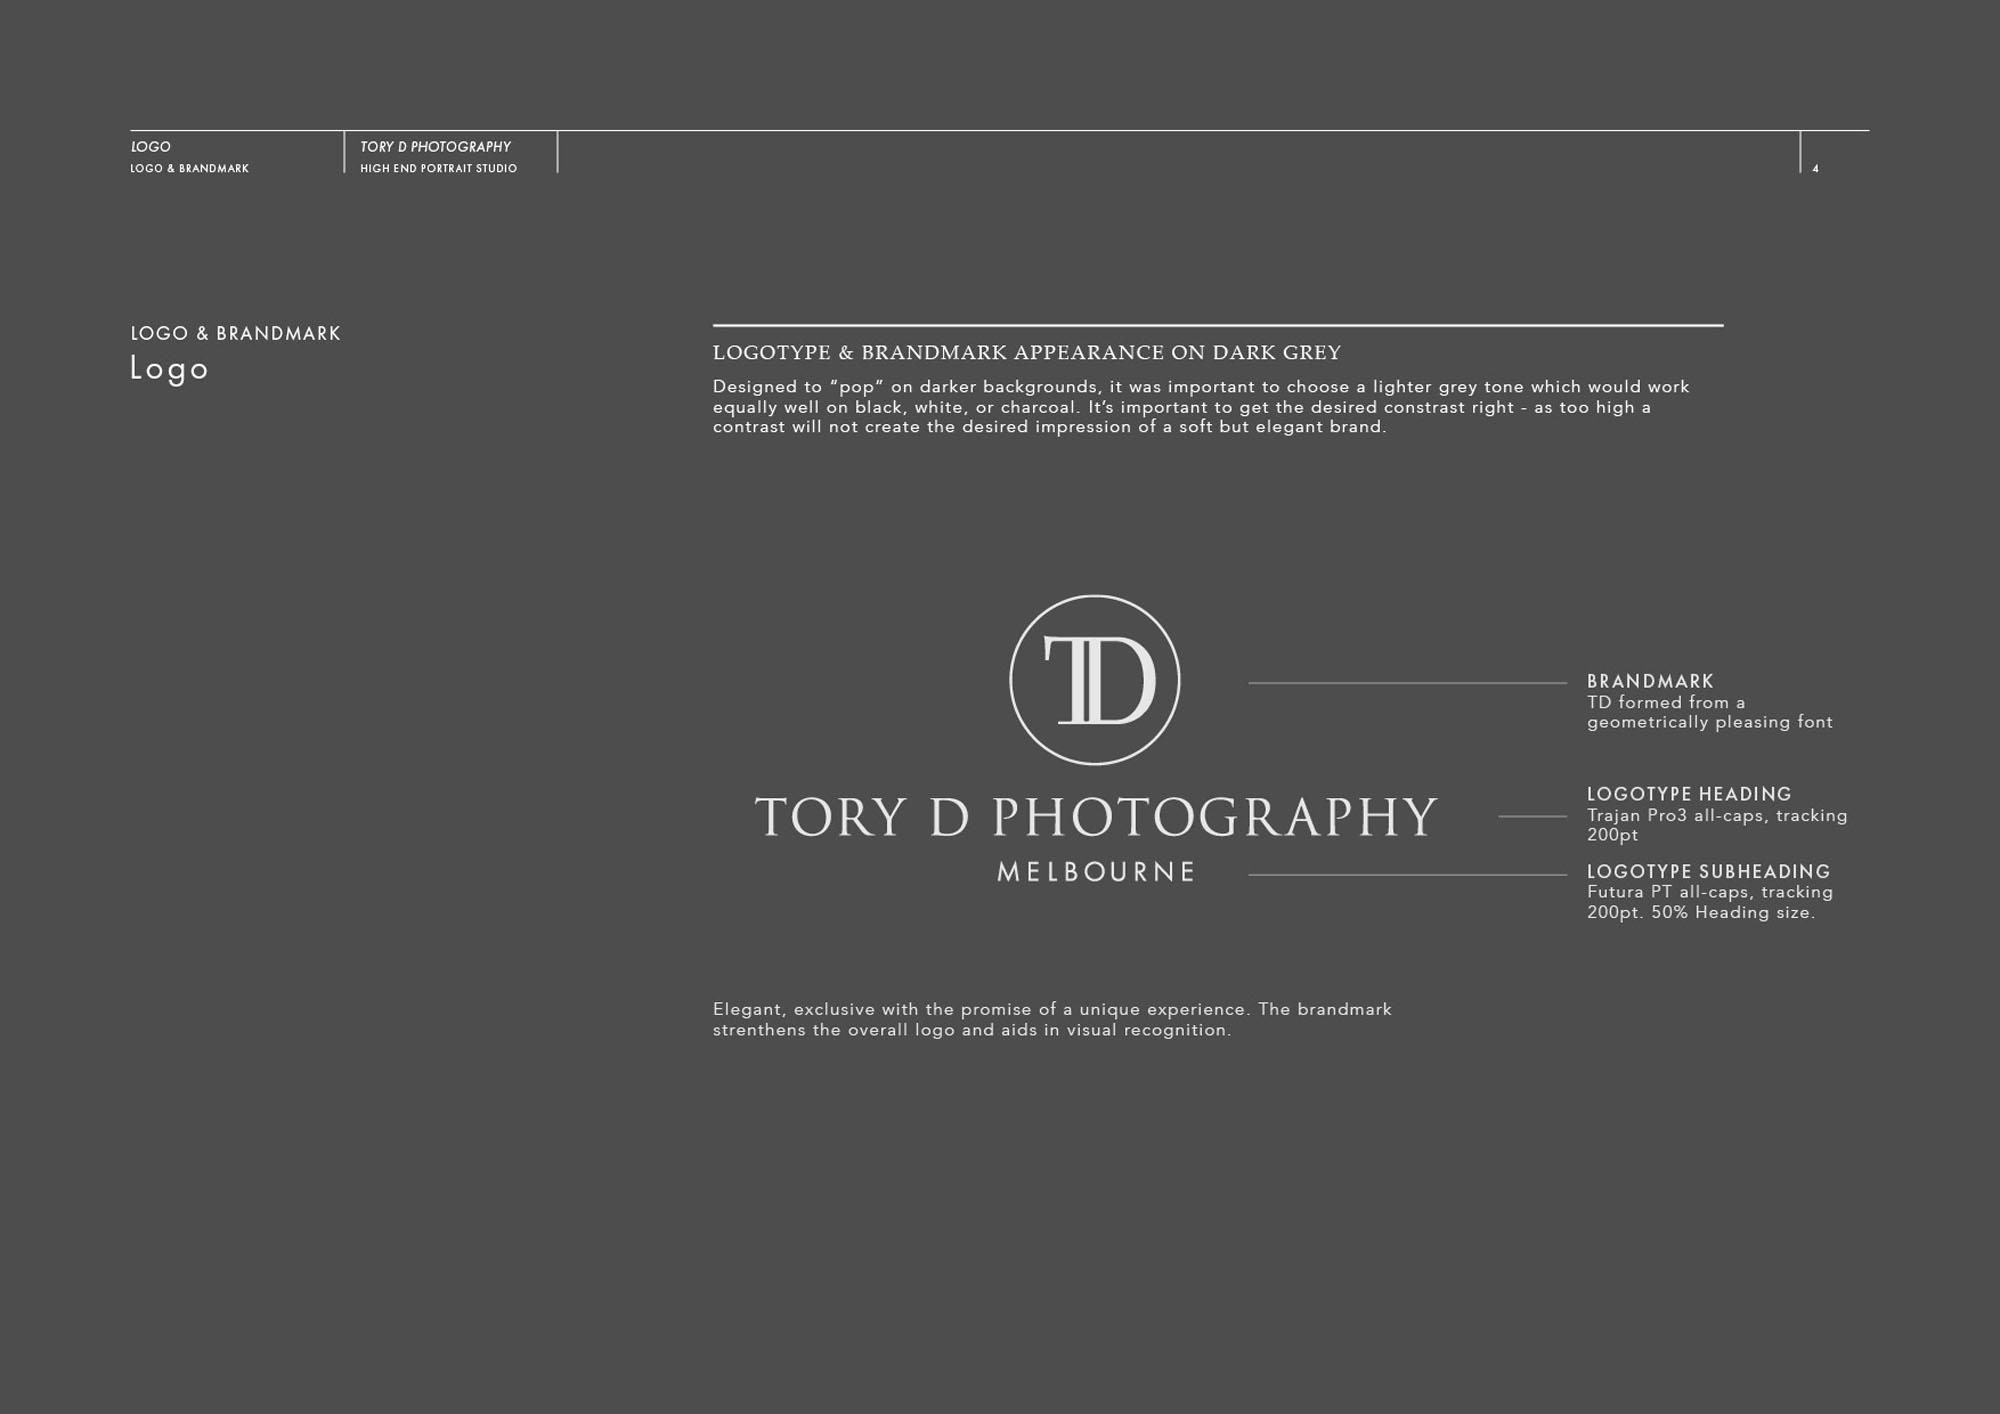 Tory D Photography Newborn Brand Identity